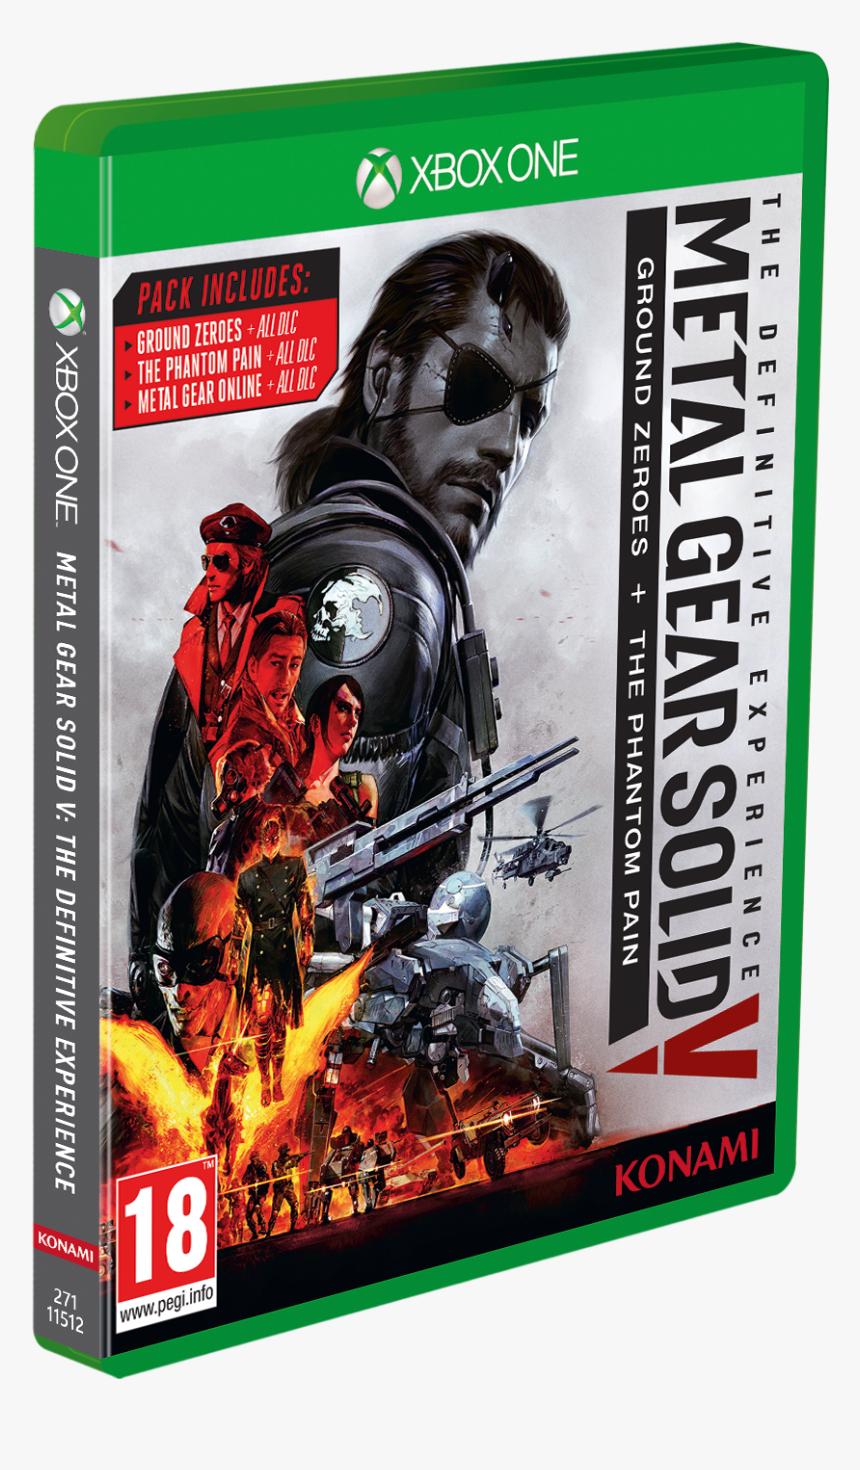 Metal Gear Solid V The Phantom Pain Steelbook, HD Png Download, Free Download